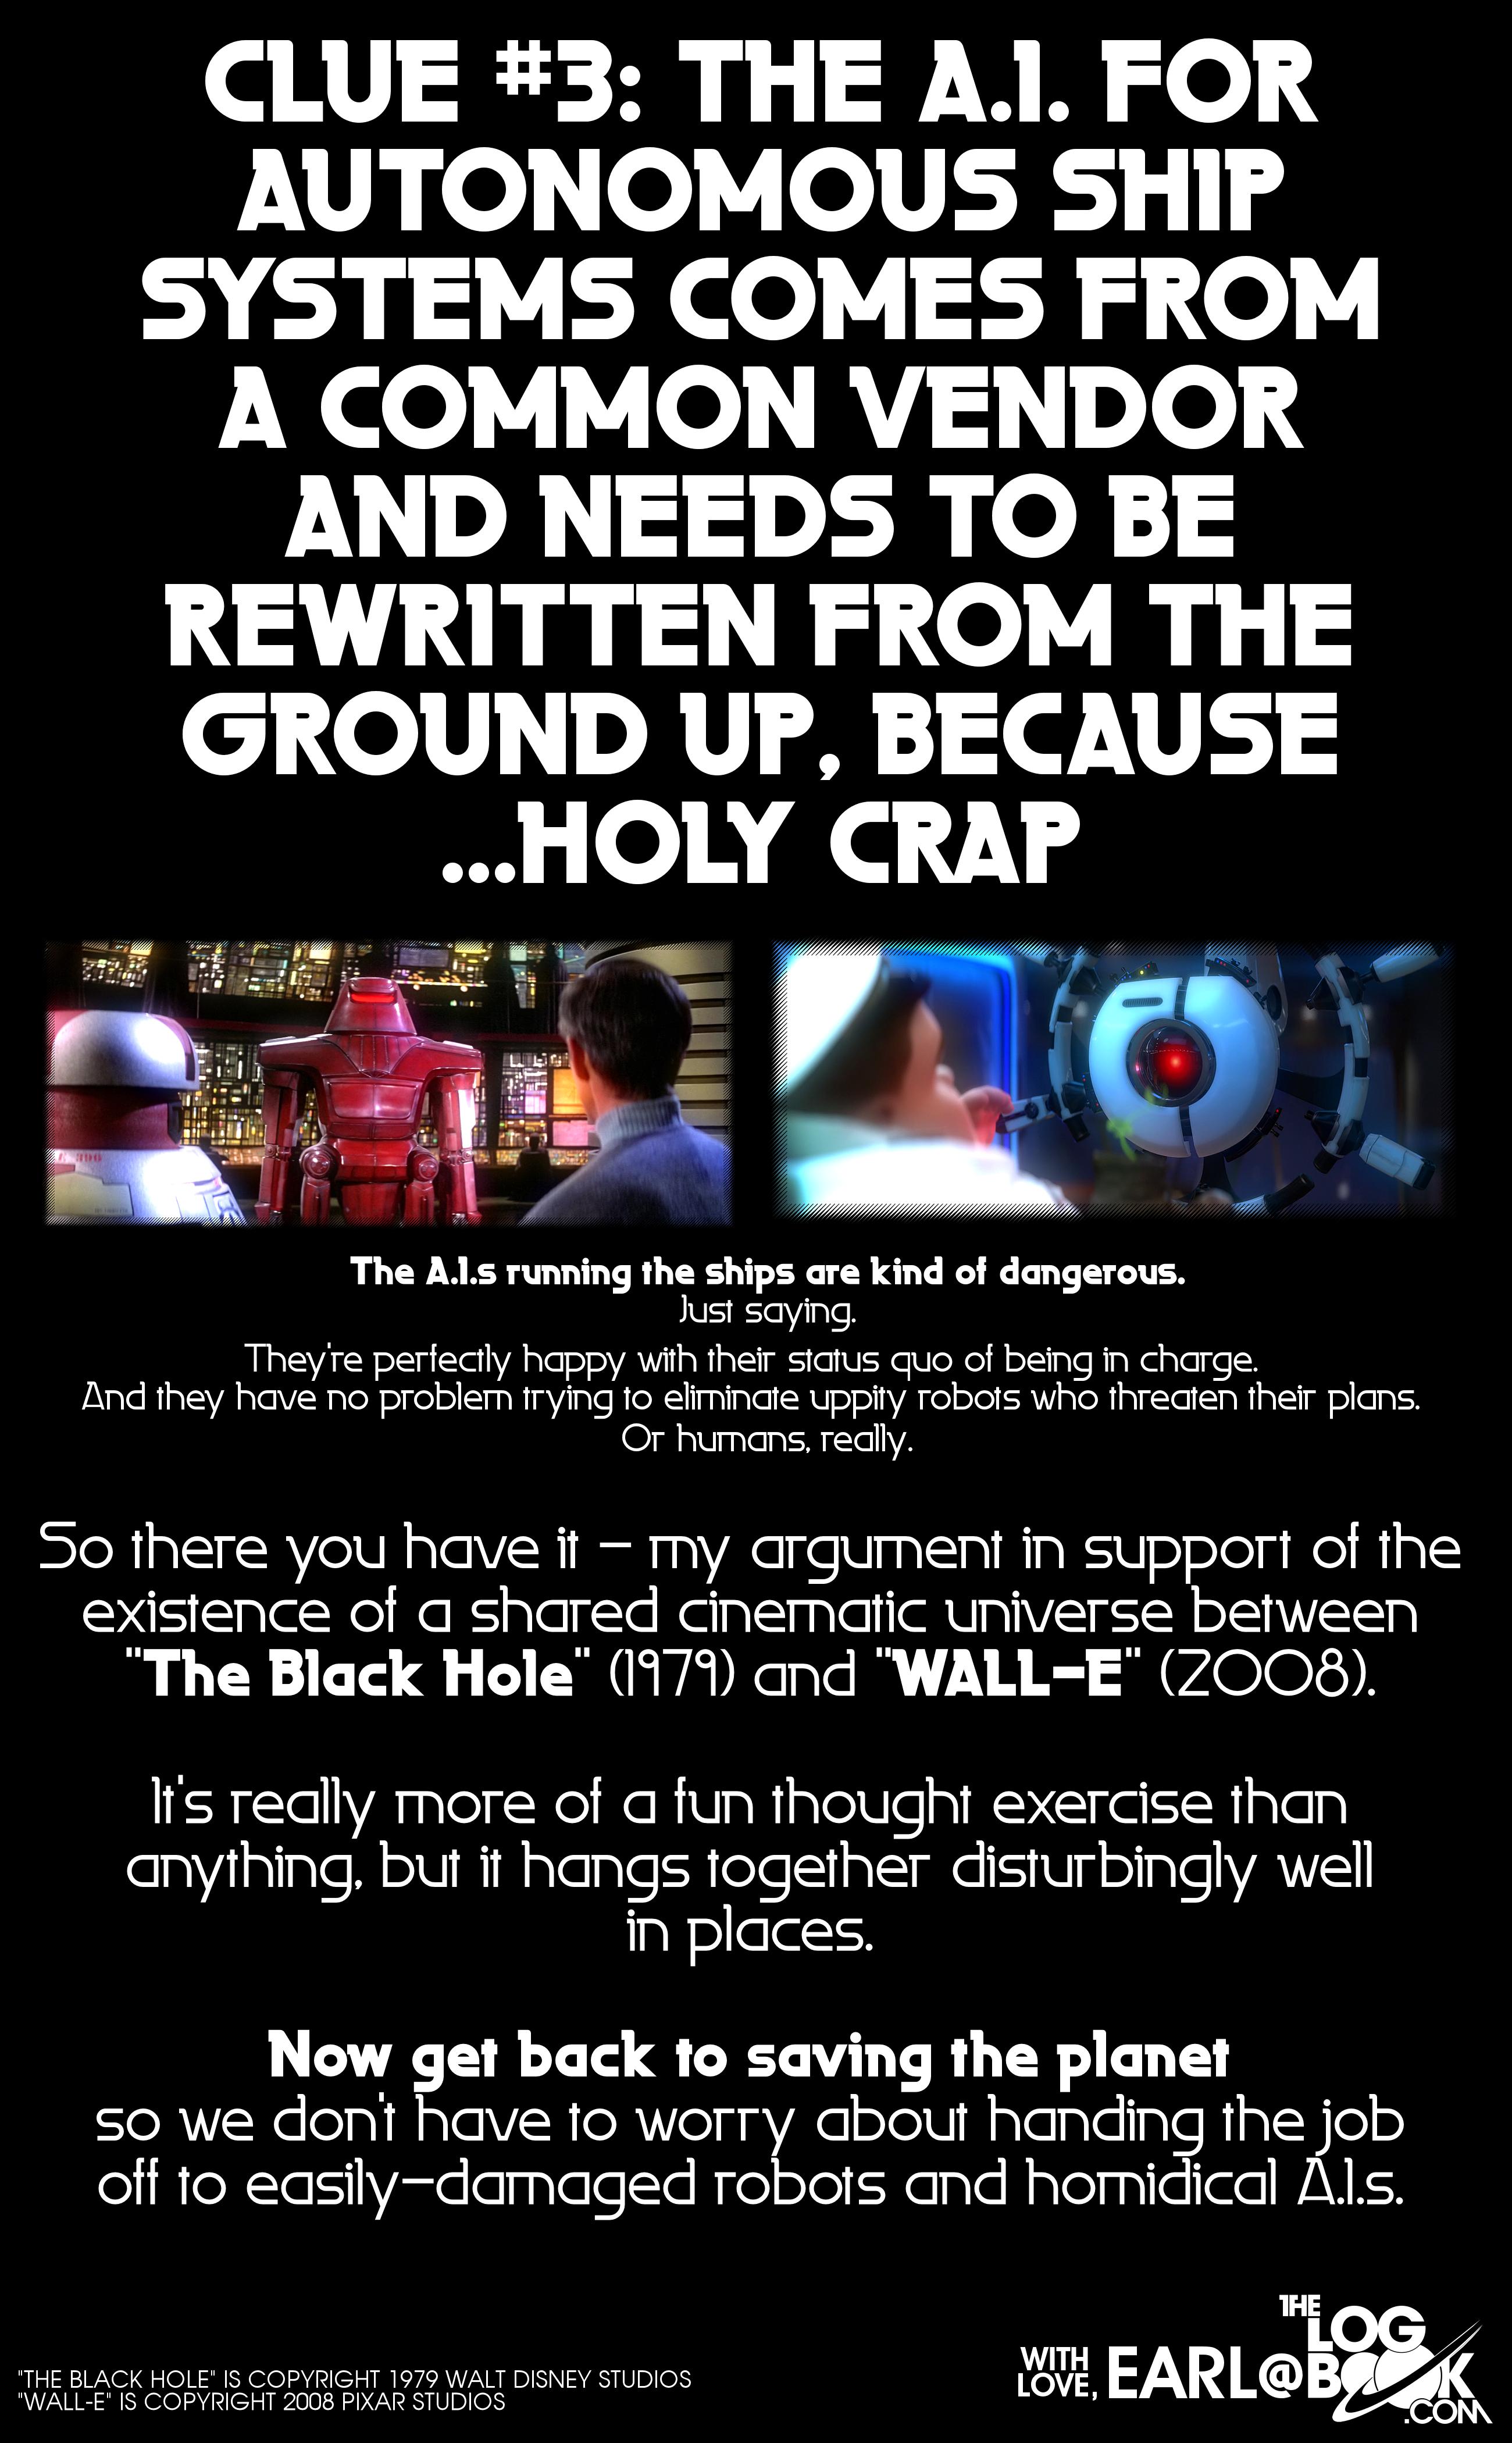 The Black Hole & WALL-E Cinematic Universe